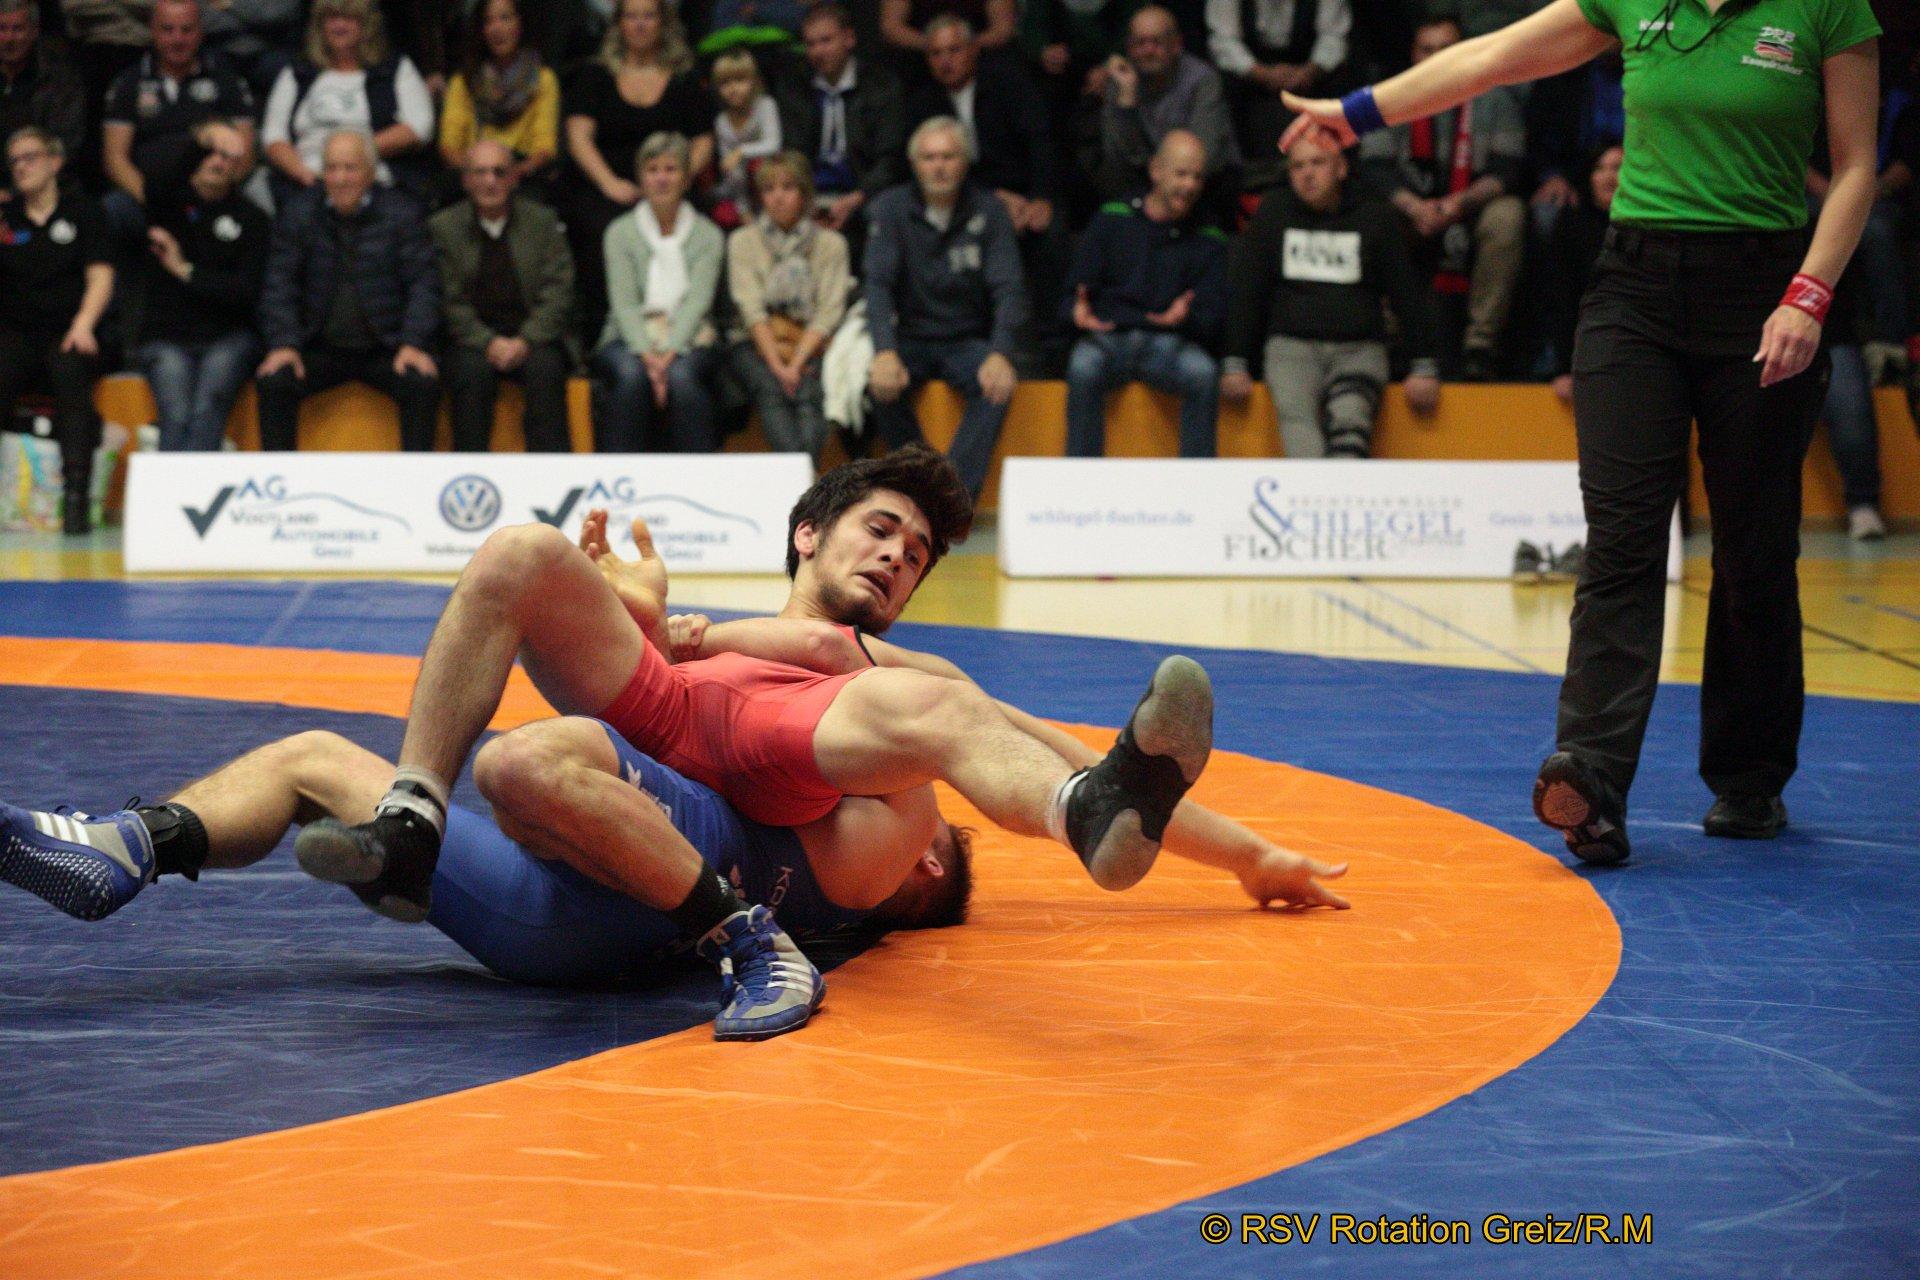 66kg Greco: Abdul Galamatov N4 (-2) (rotes Trikot), RSV Rotation Greiz gegen Christopher Kraemer (3), Red Devils Heilbronn 0:4/TÜ/4:19/05:03